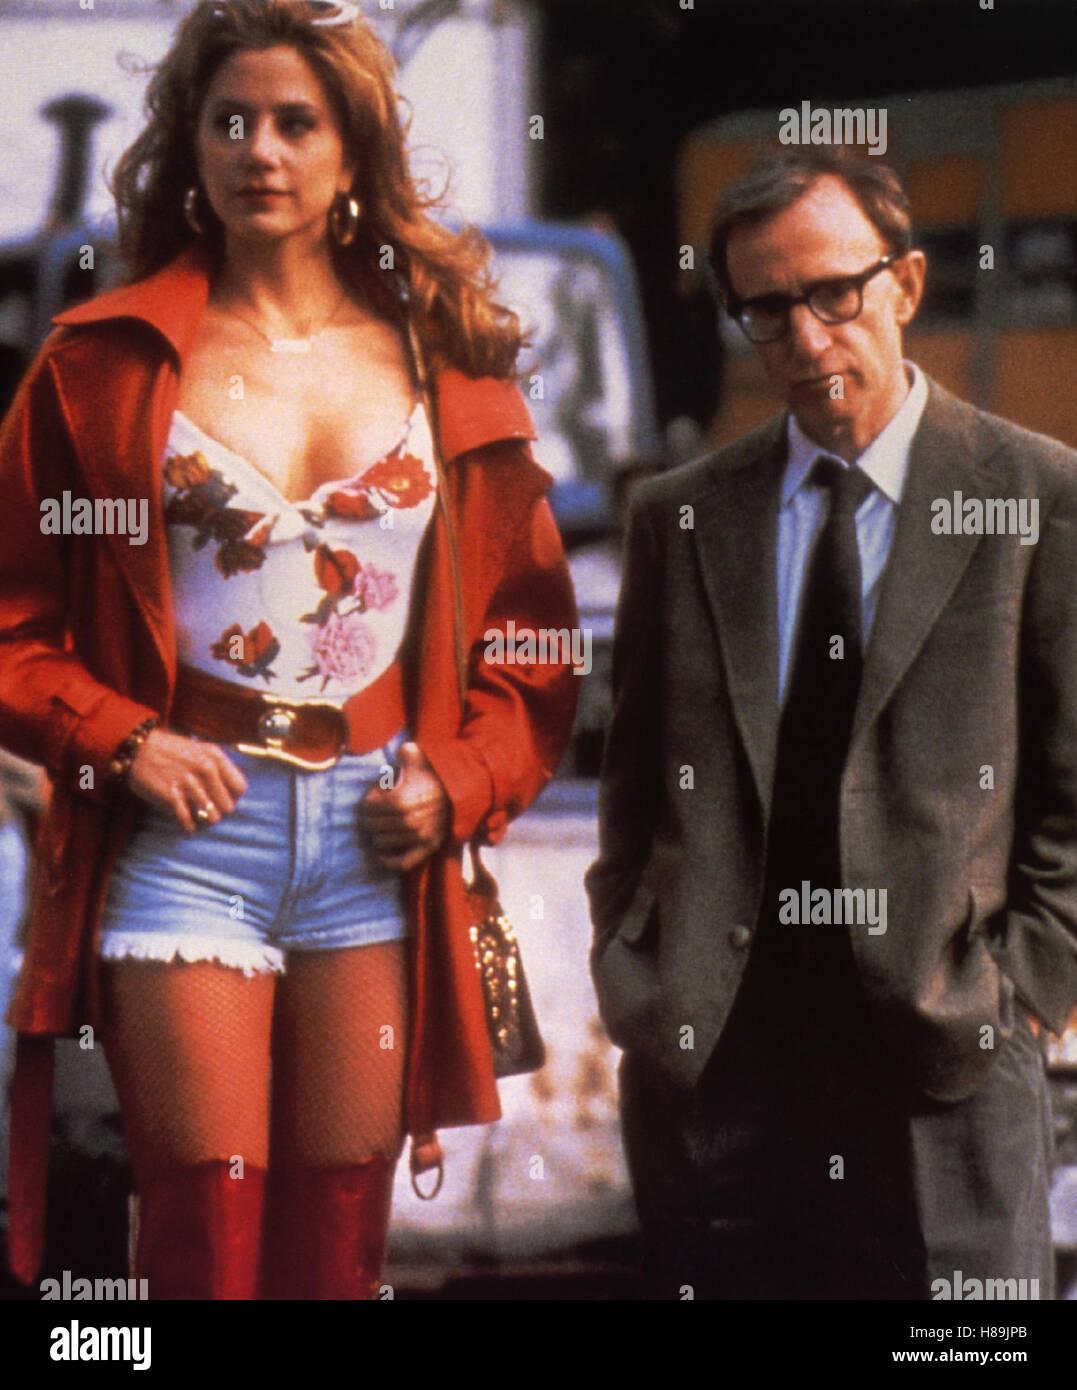 Geliebte Aphrodite, (MIGHTY APHRODITE) USA 1996, Regie: Woody Allen, WOODY ALLEN, MIRA SORVINO, Stichwort: Hot Pants - Stock Image